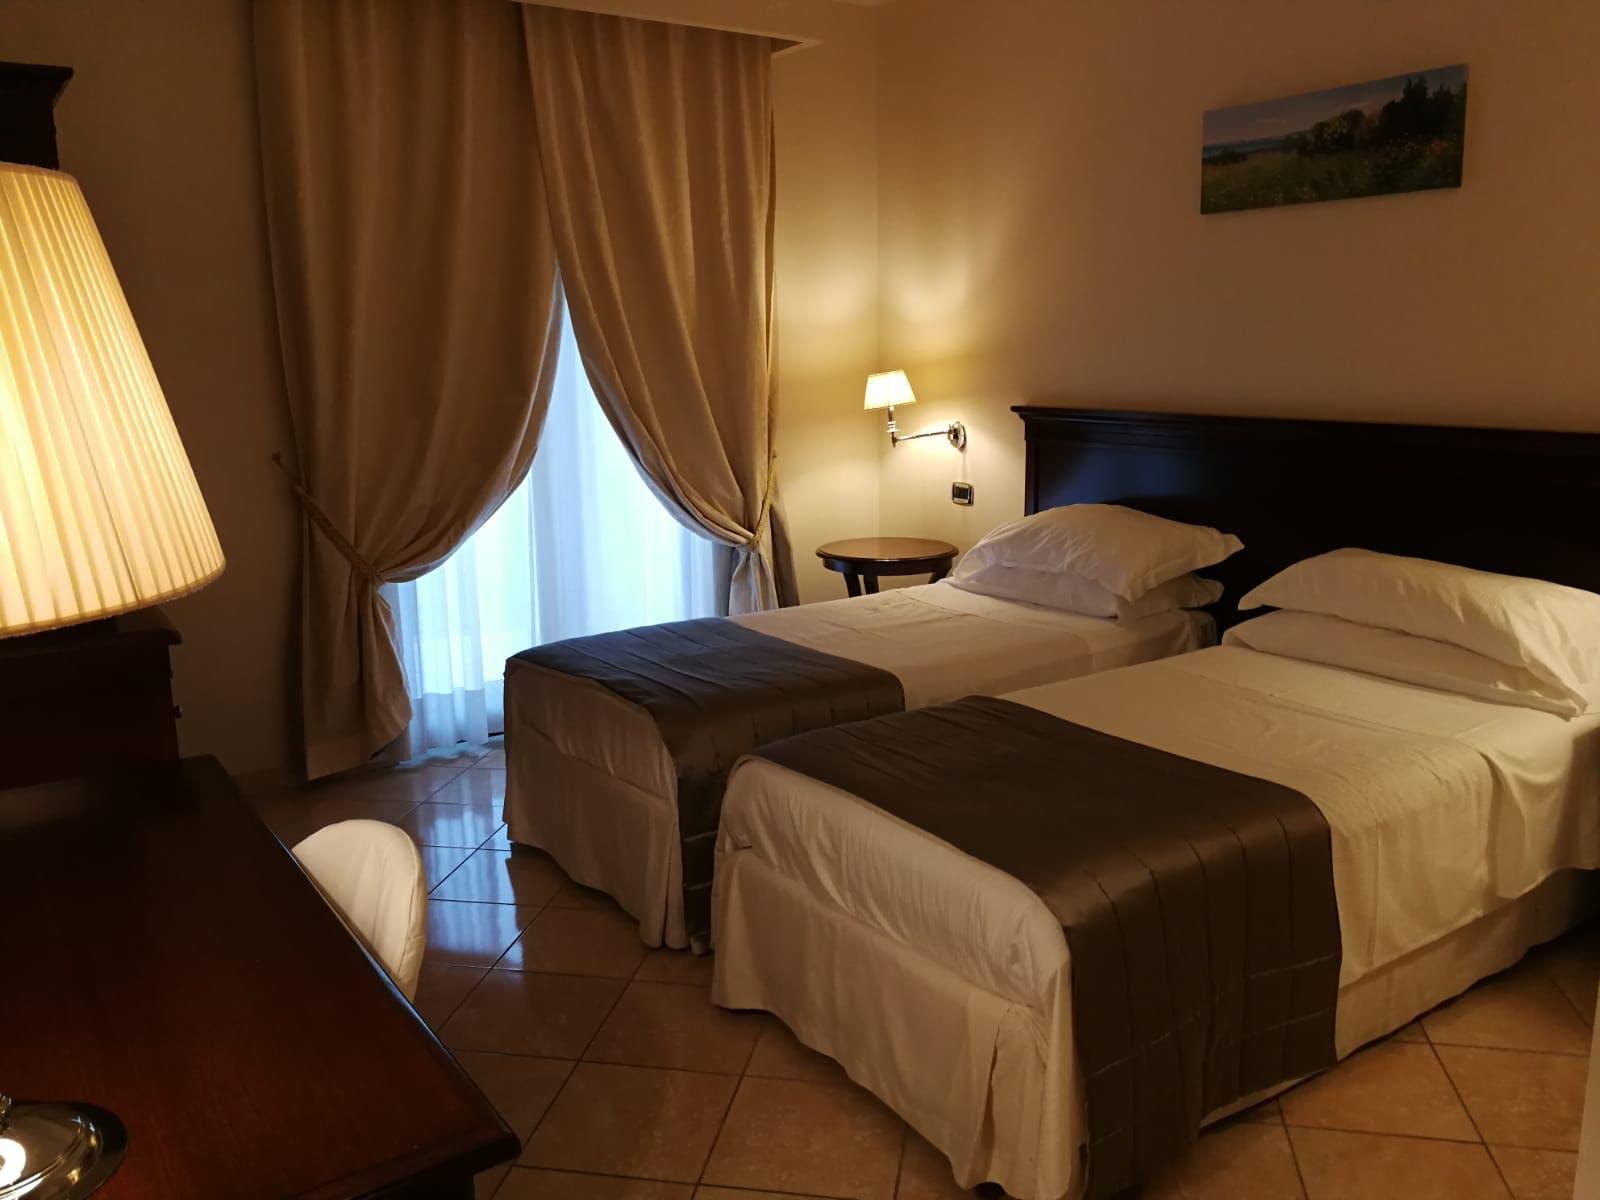 Twin Room | Hotel San Giorgio Crotone